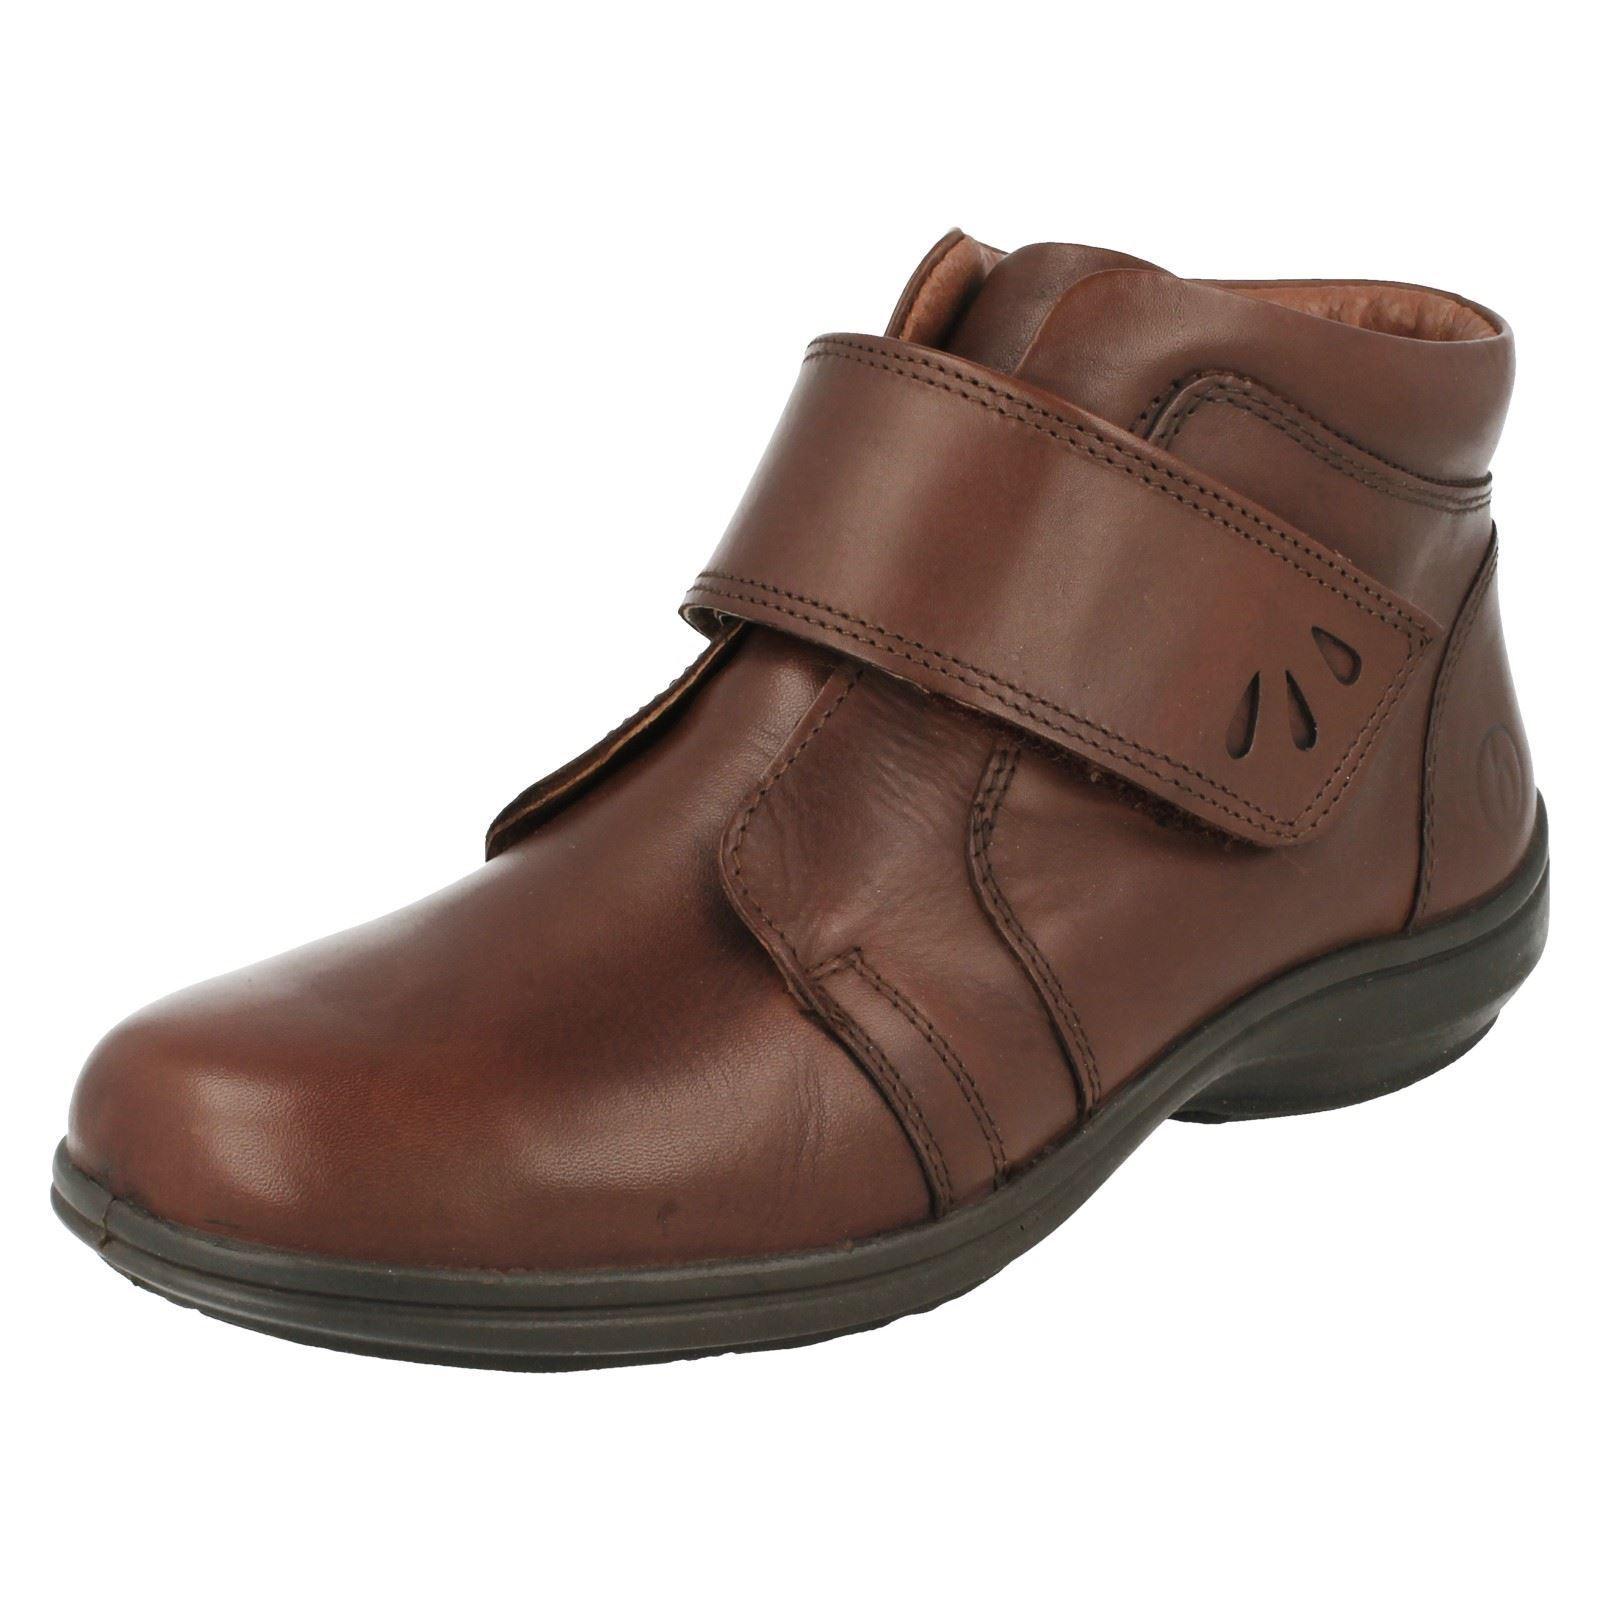 Easy B Ladies Ladies Ladies Ankle Boots - Path 00e122